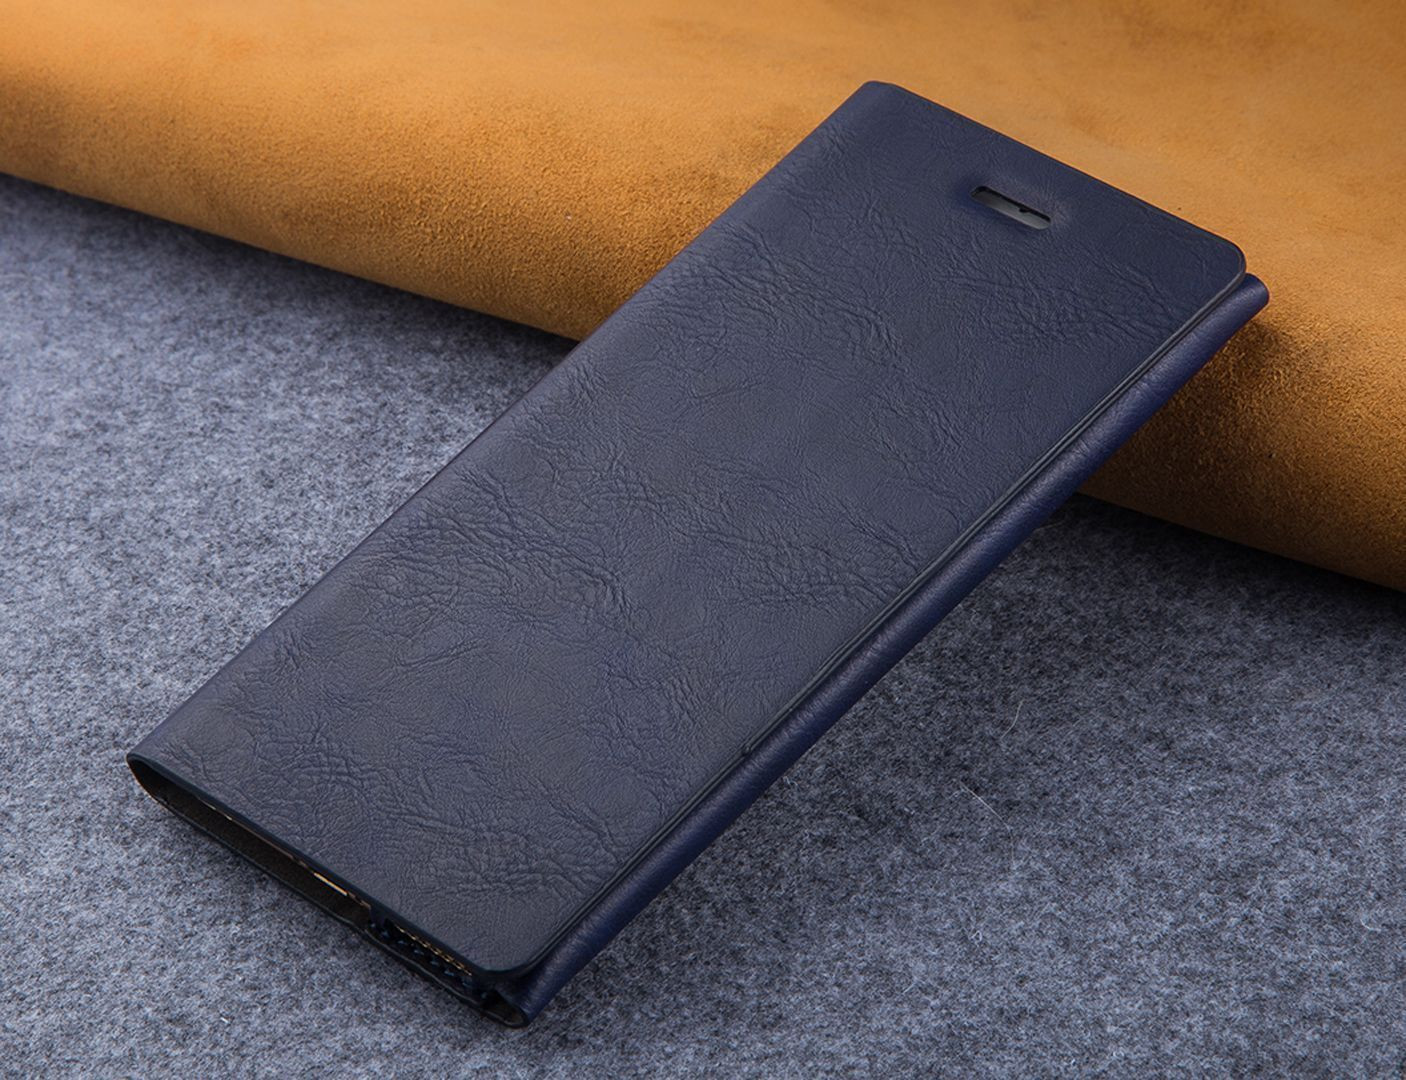 Joyroom 174 Apple Iphone 7 Plus England Folio With Stand